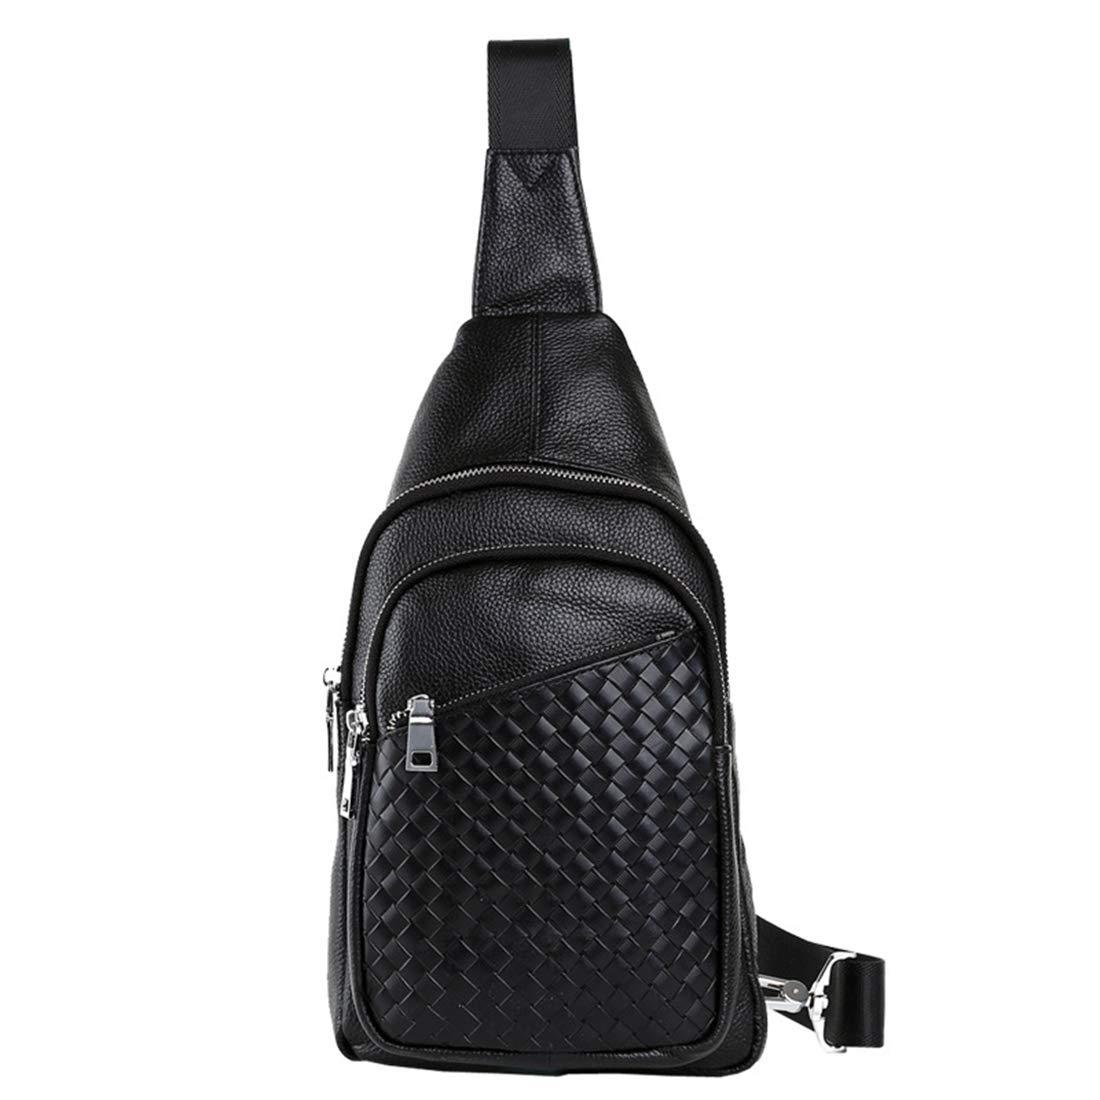 RABILTY Men Genuine Leather Chest Bag Casual Shoulder Bag Woven Messenger Bag Travel Fitness Sports Bag Carry-on Backpack Color : Photo Color